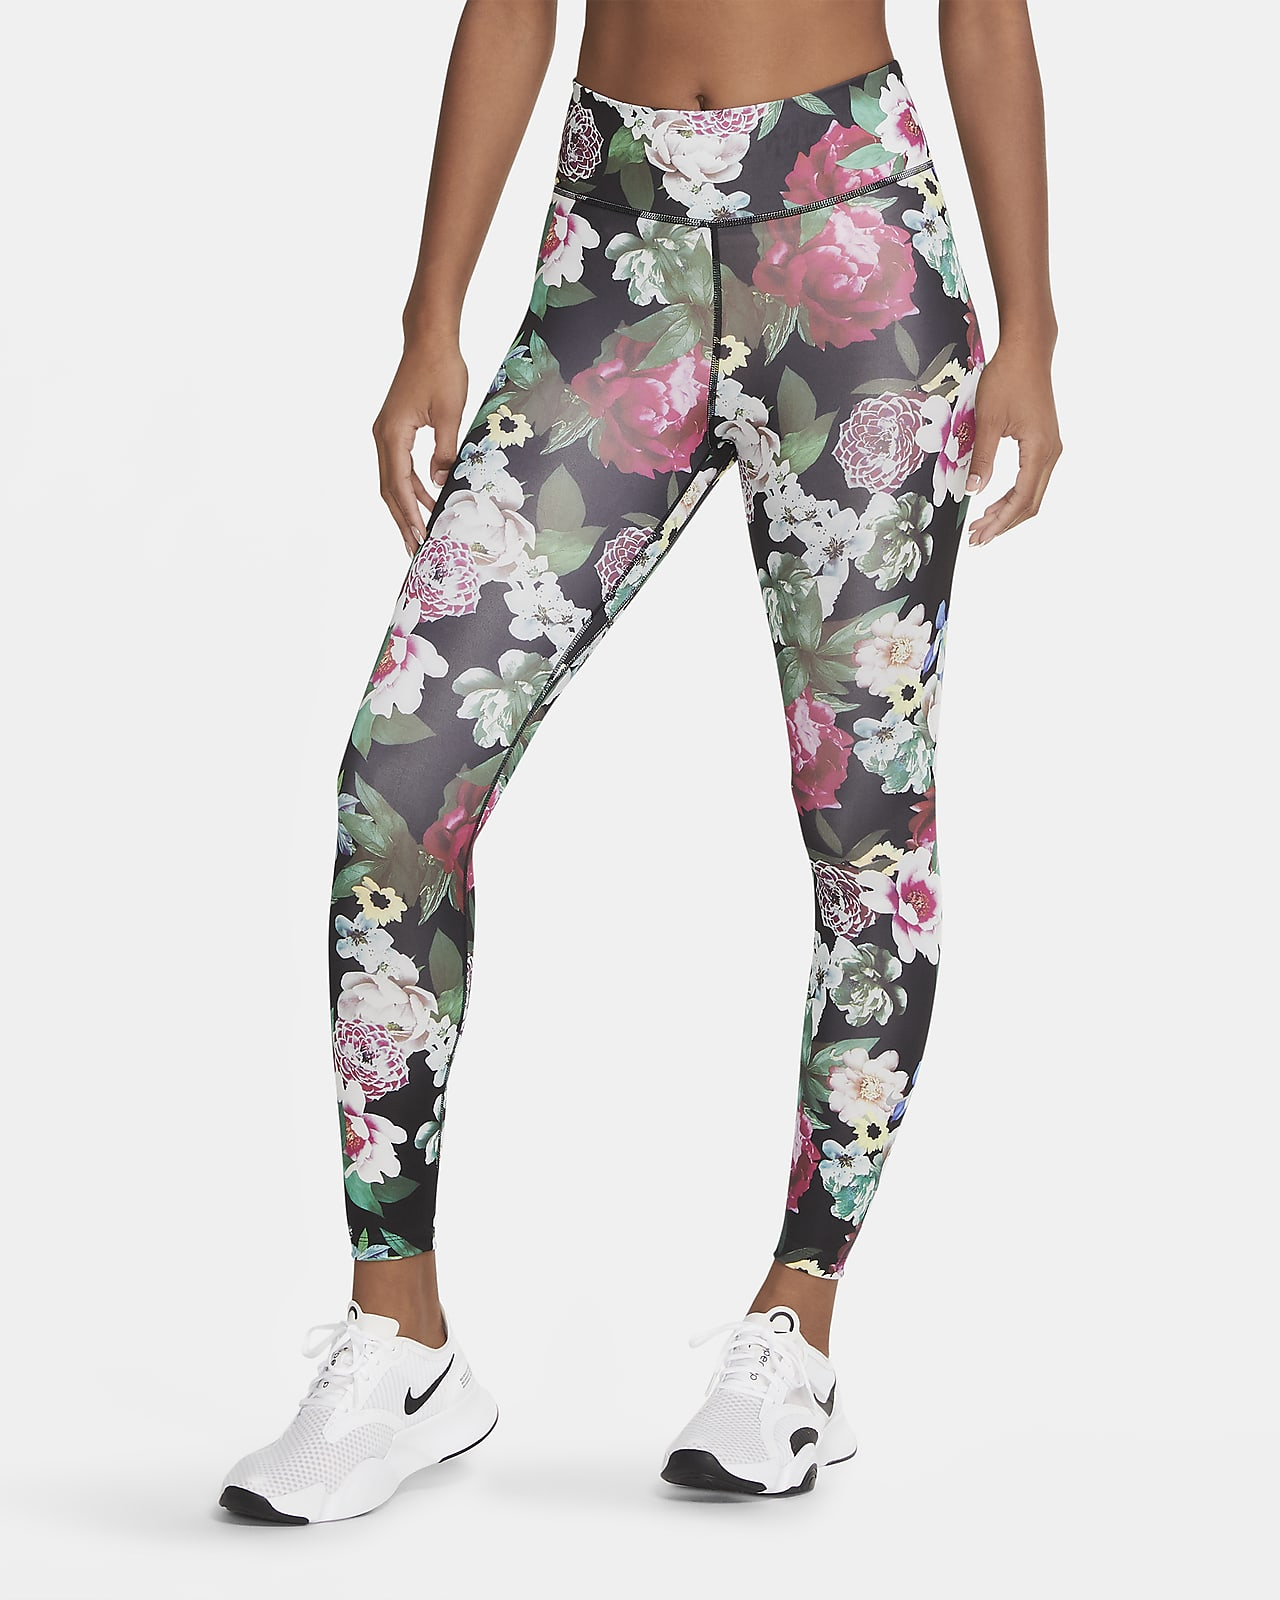 Nike One 7/8-tights met bloemenprint voor dames